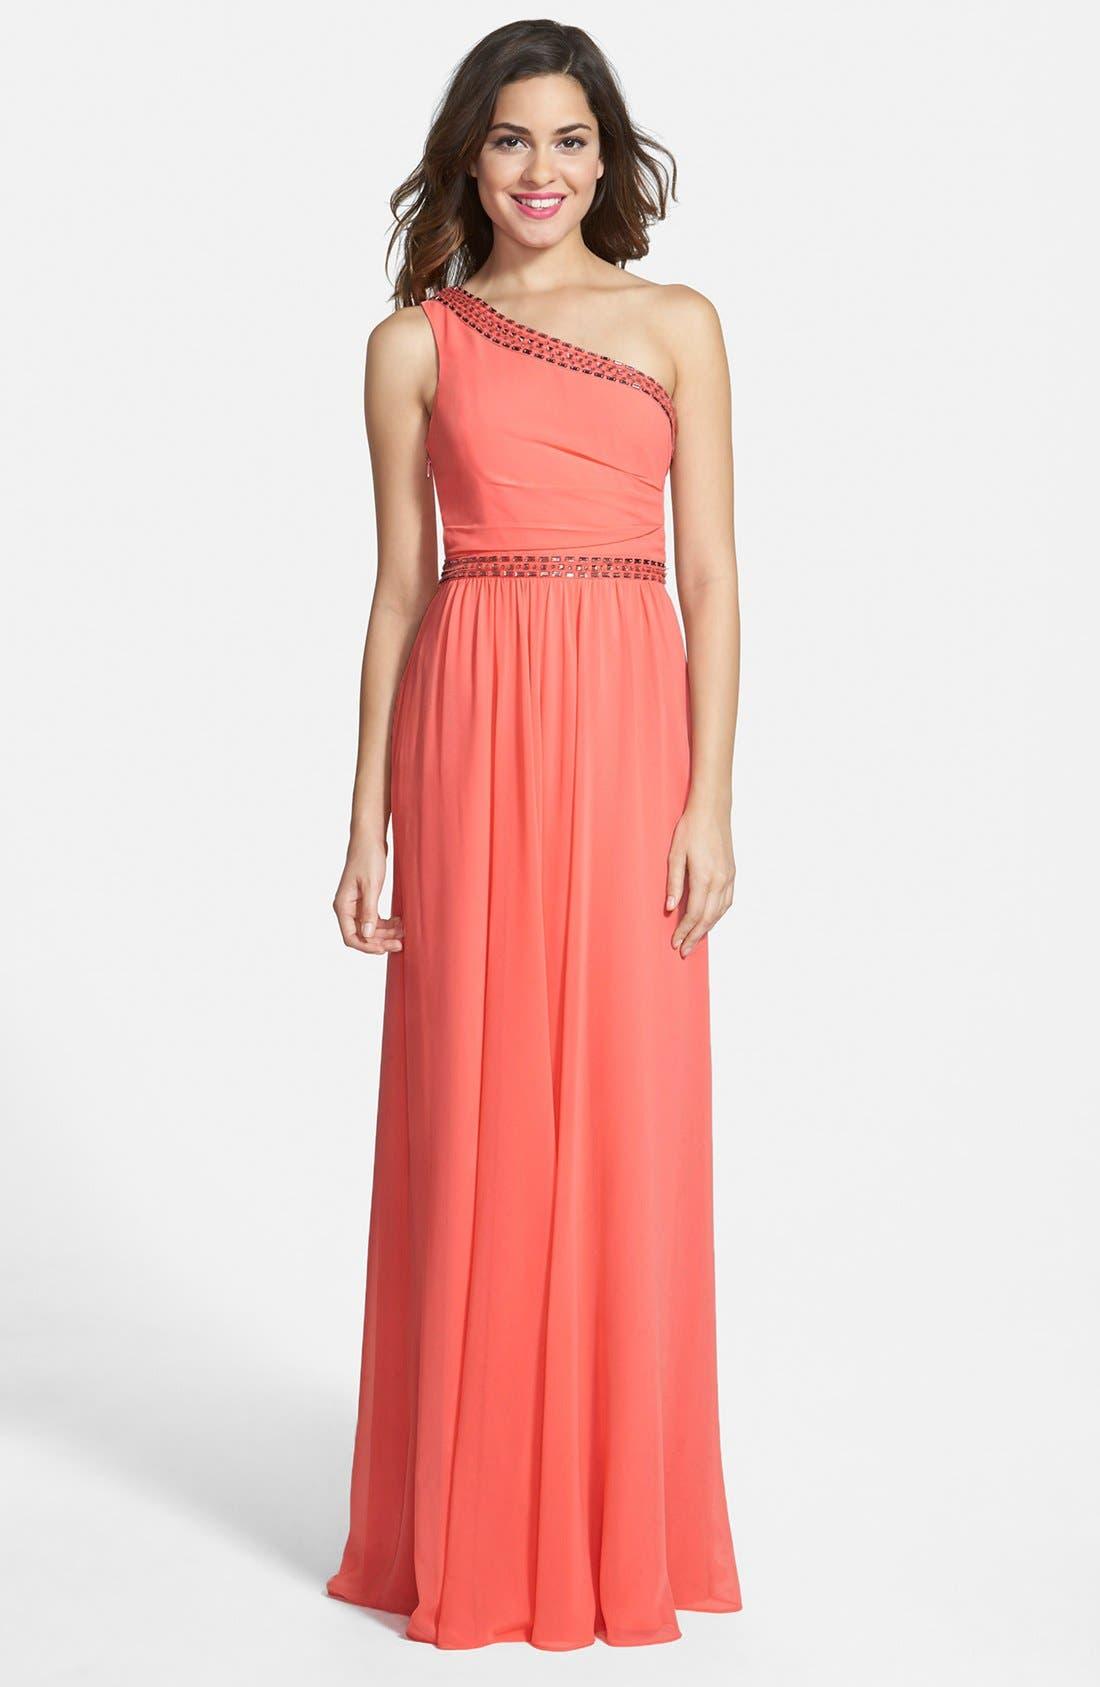 Alternate Image 1 Selected - BCBGMAXAZRIA 'Daniele' Embellished One-Shoulder Georgette Gown